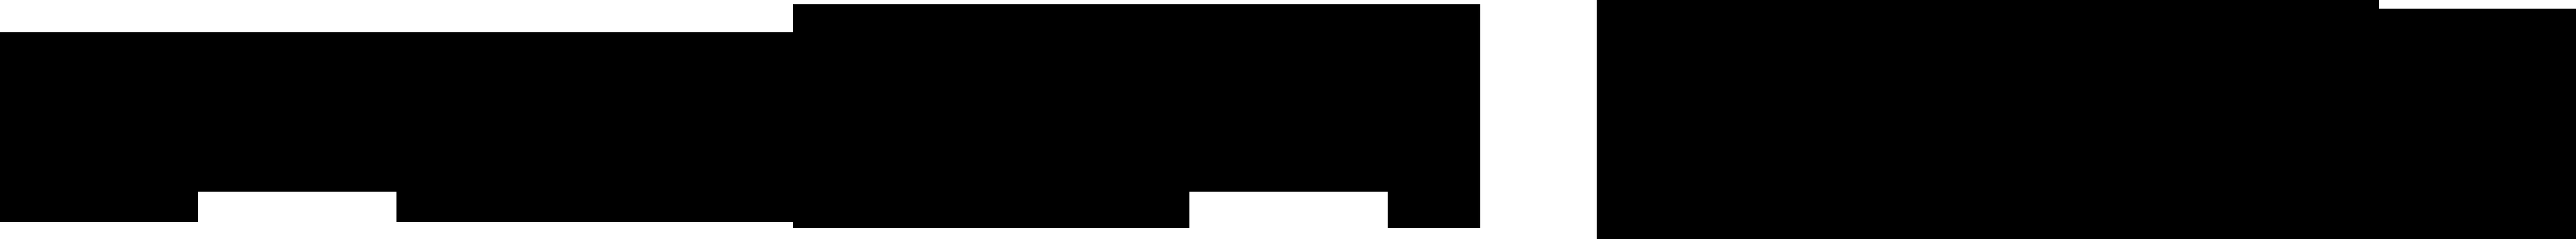 Aデザイン研究所